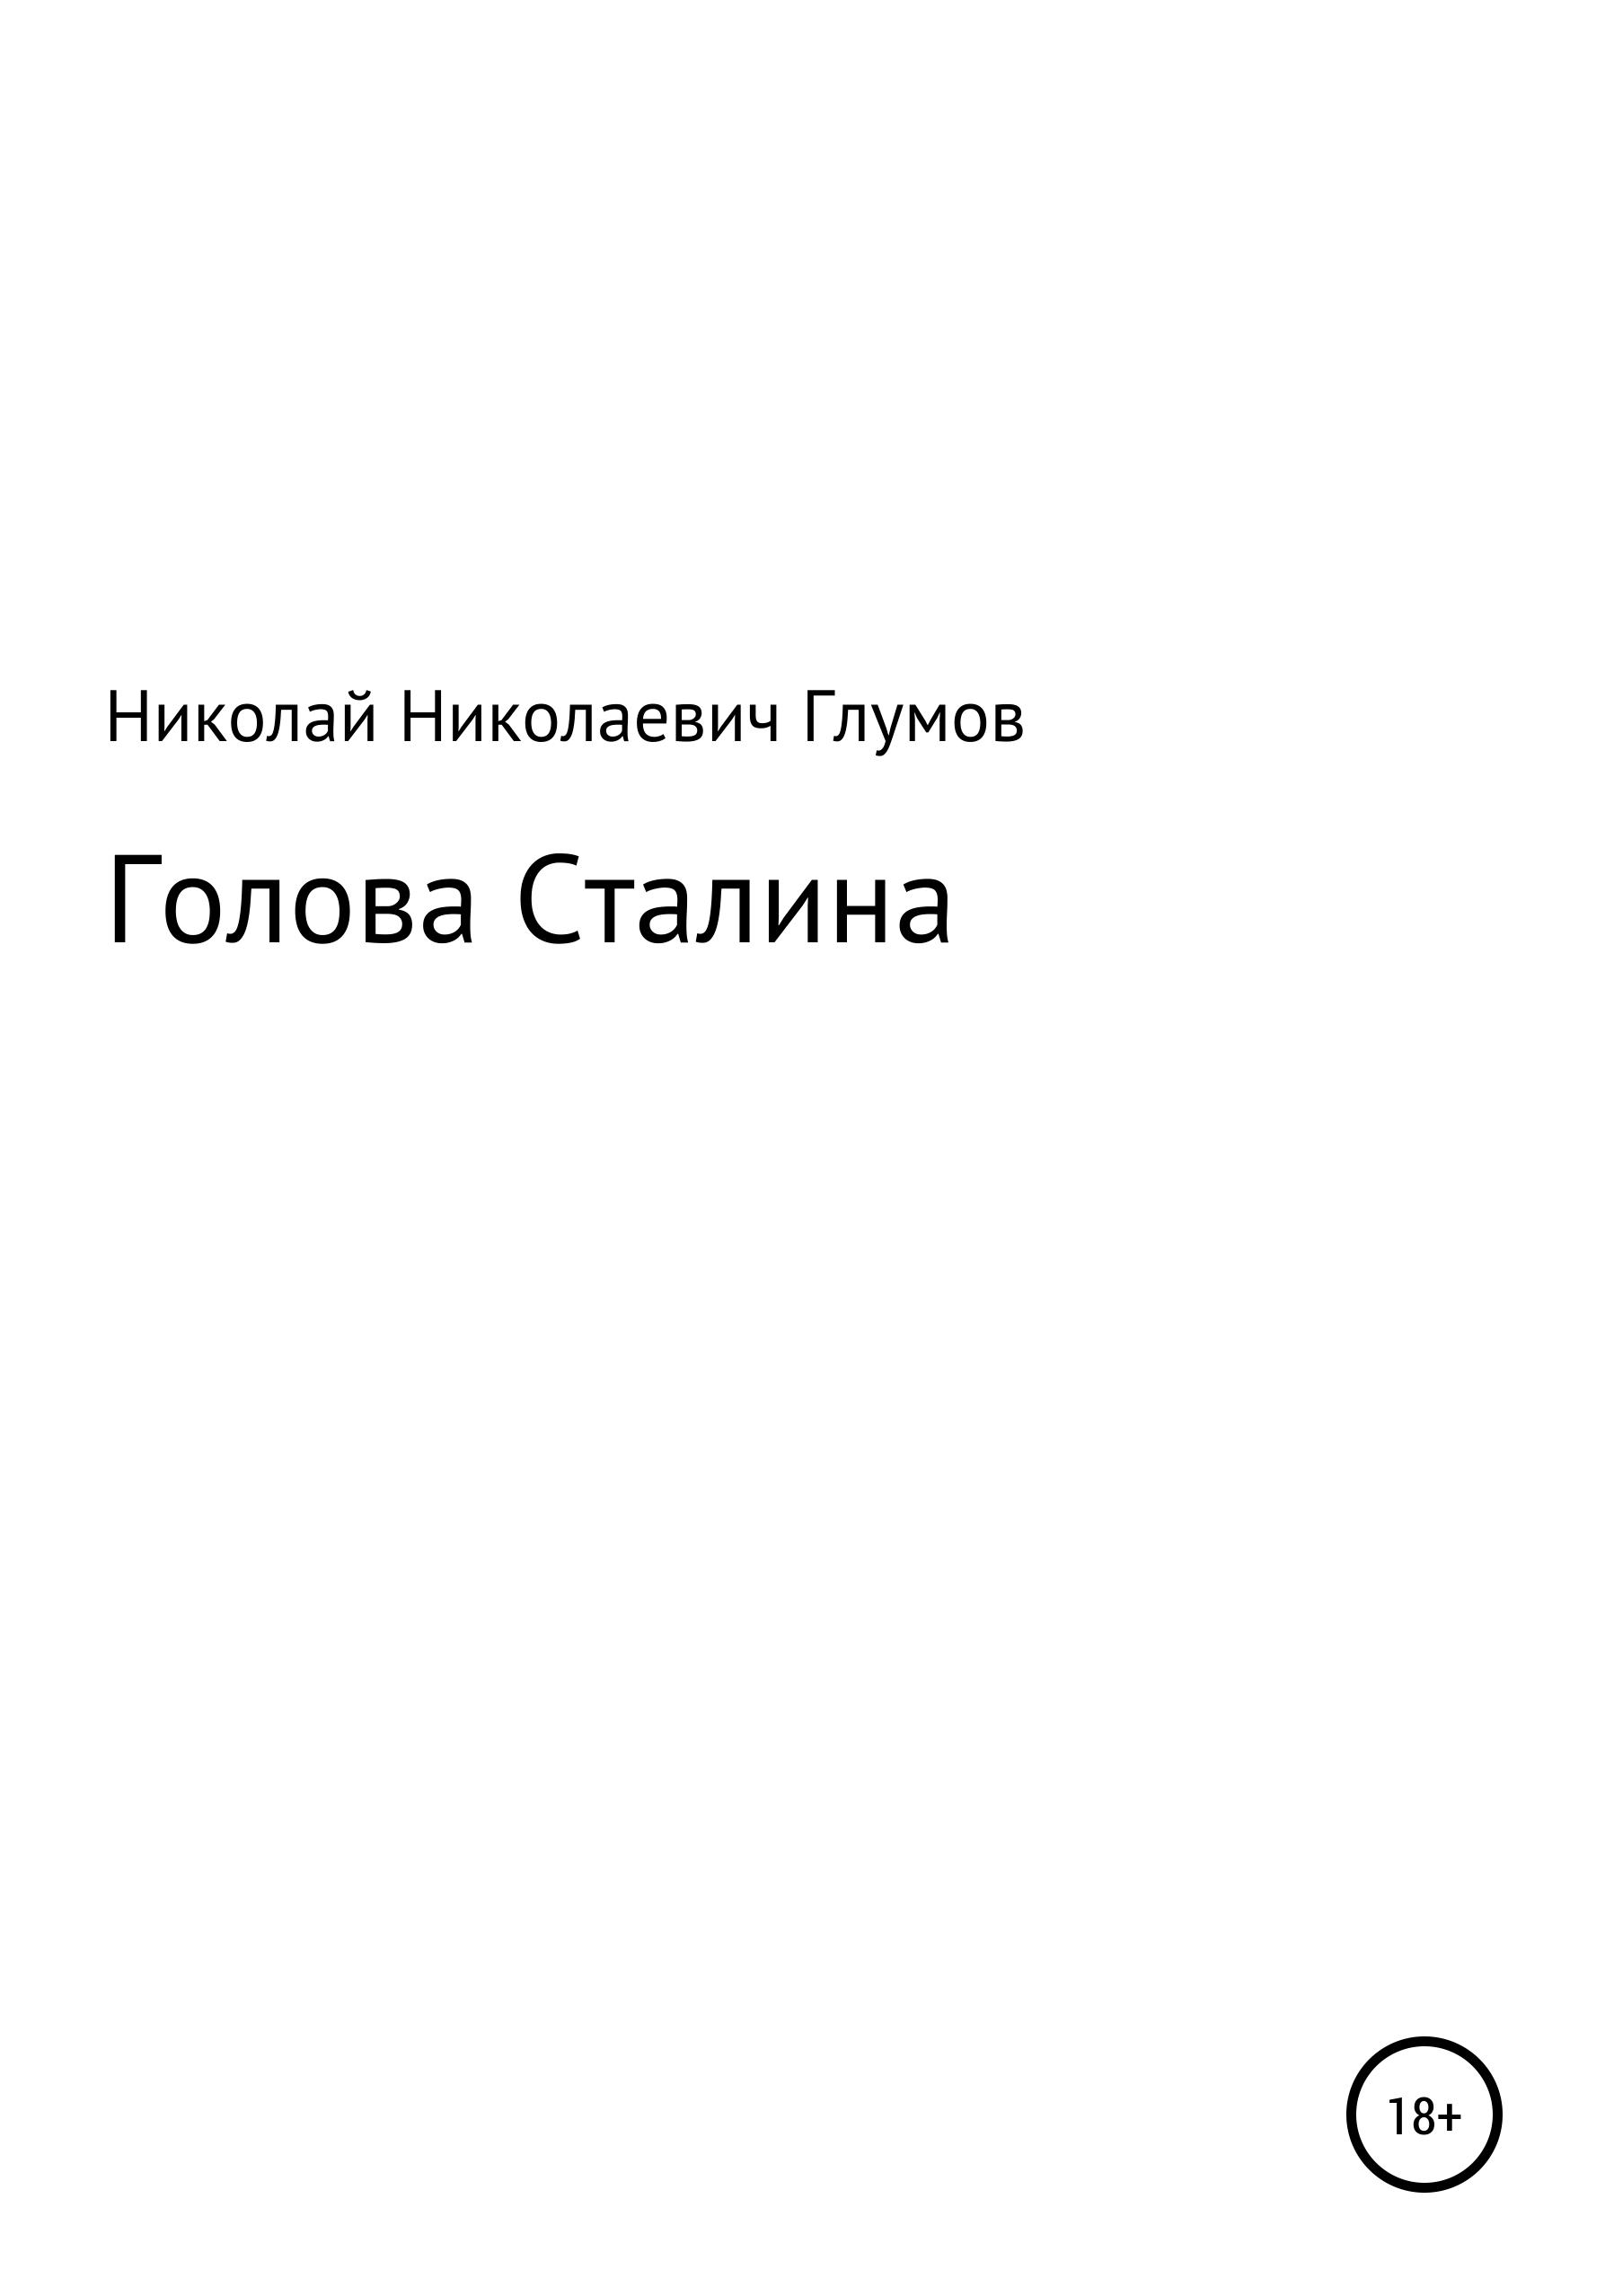 Николай Николаевич Глумов Голова Сталина балаян лев ашотович вернуть сталина